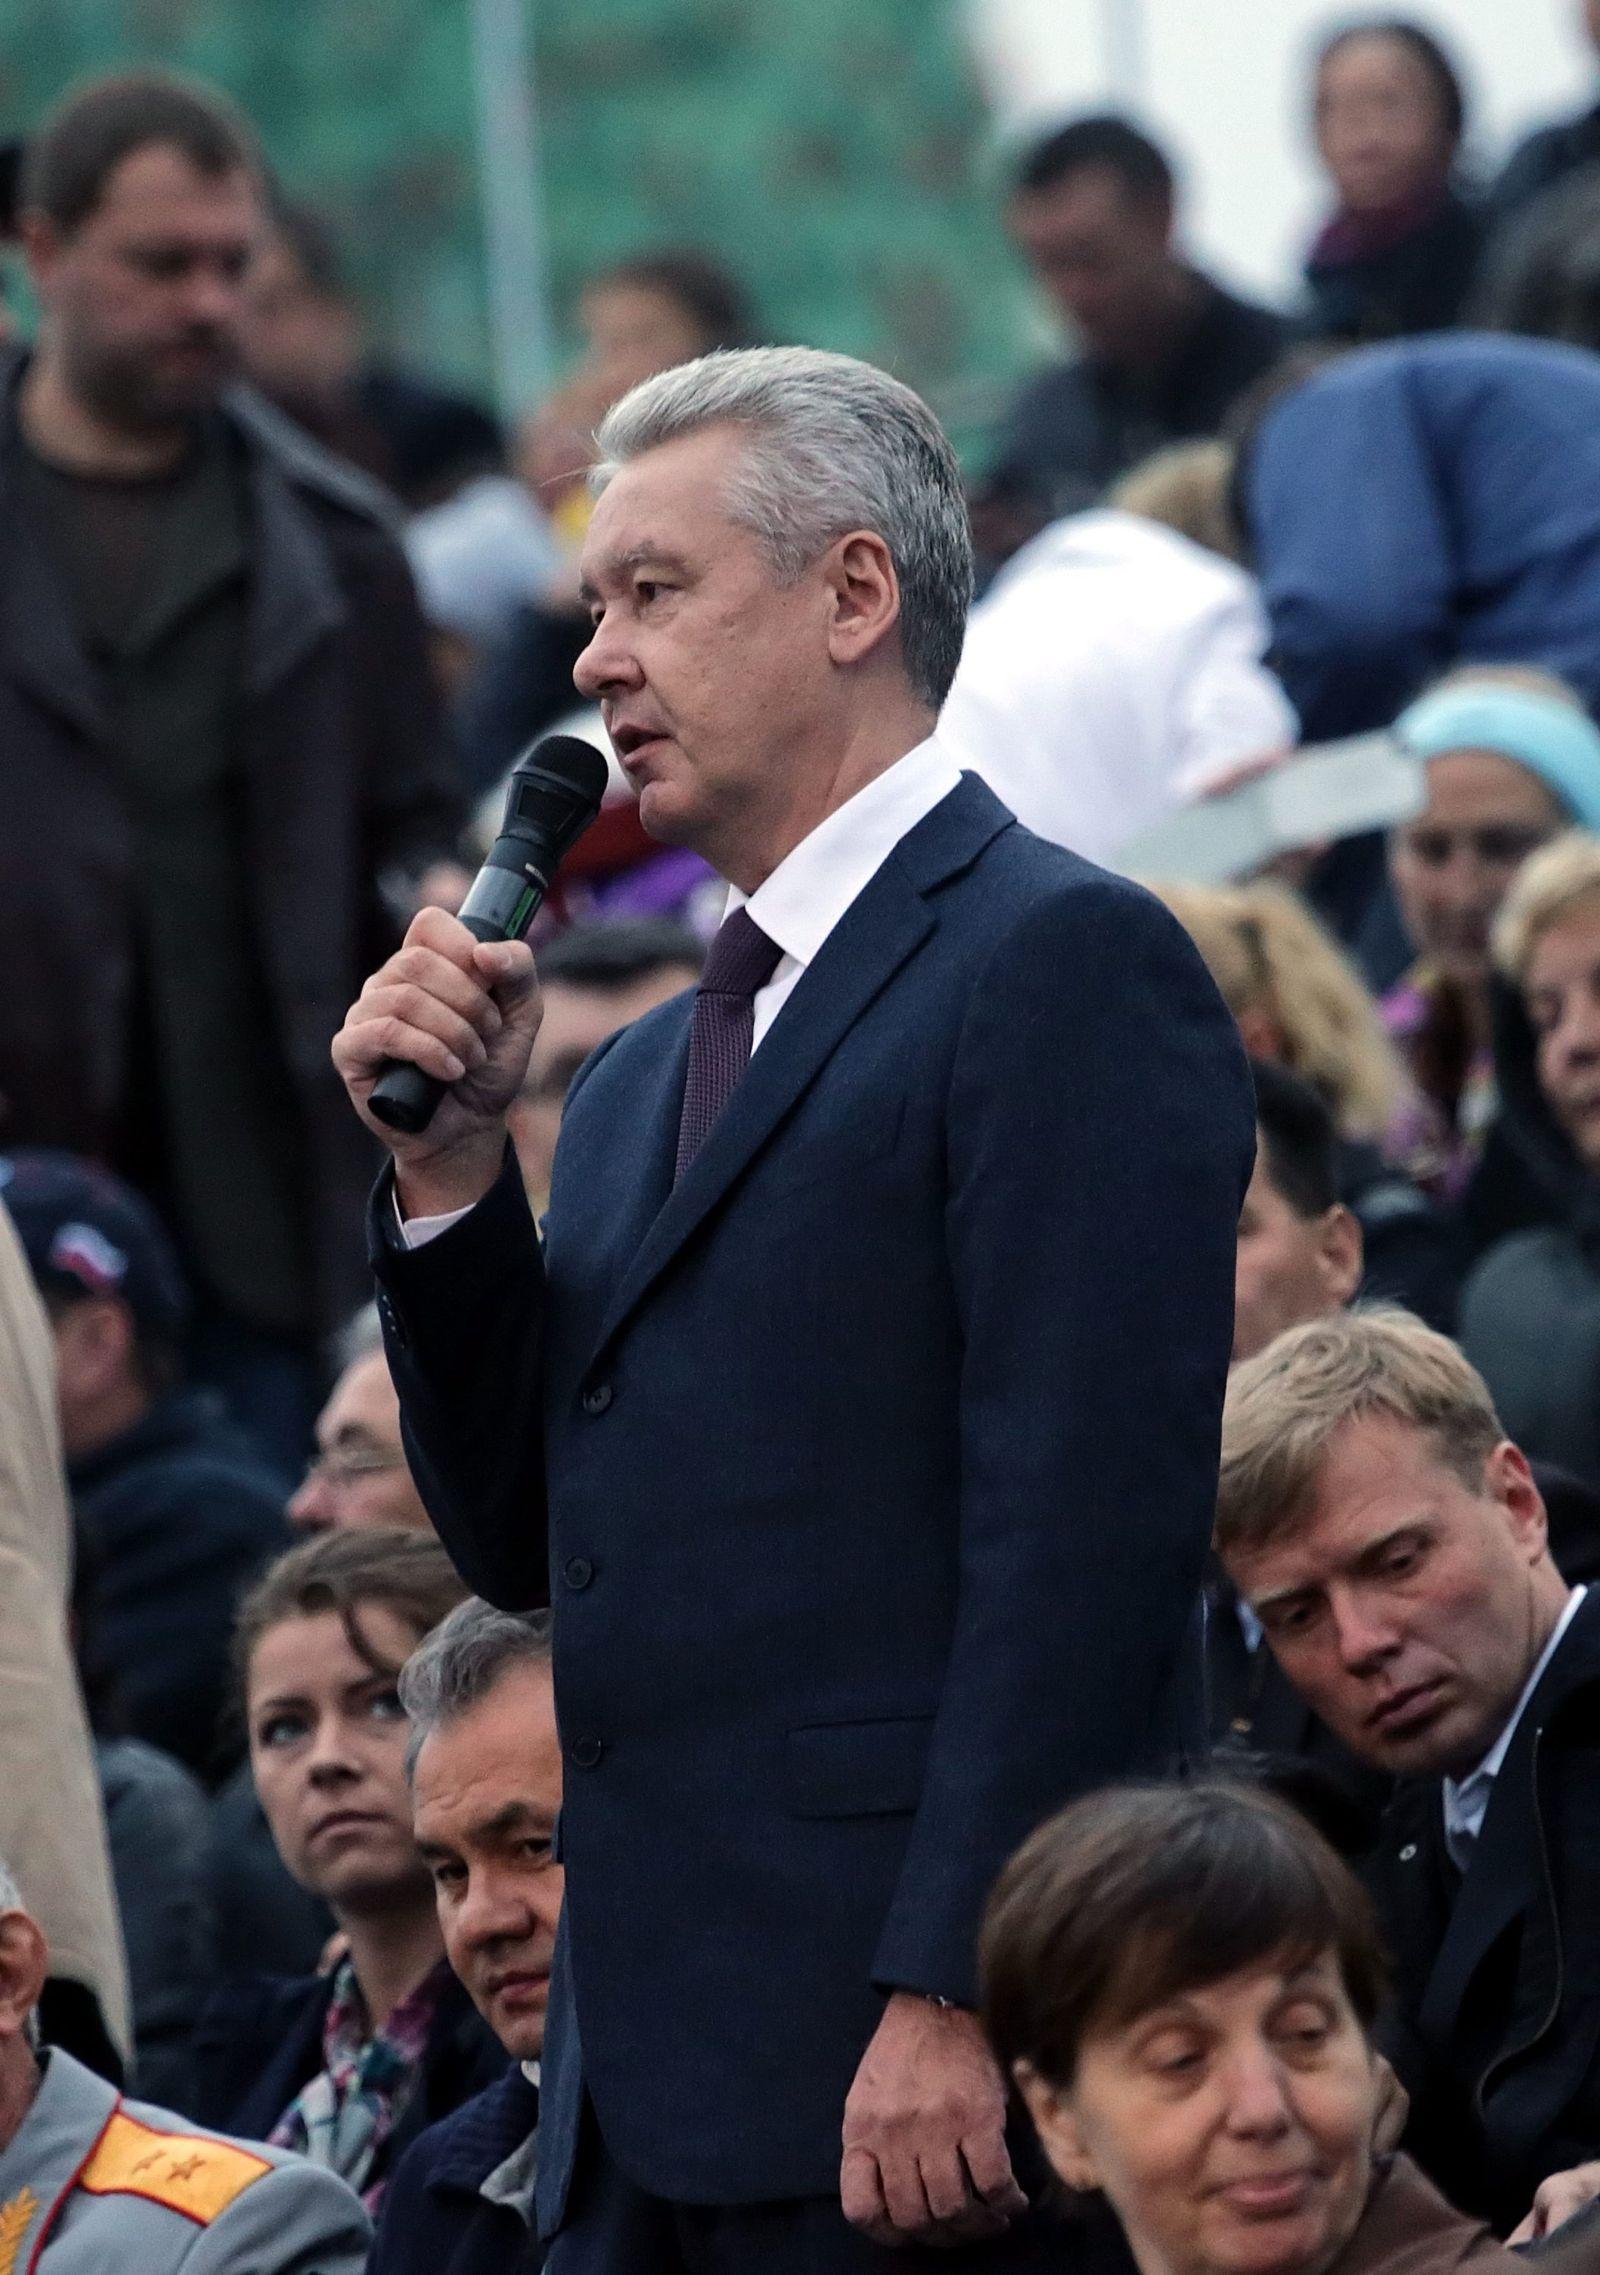 Acting Moscow Mayor and mayoral candidate Sergei Sobyanin